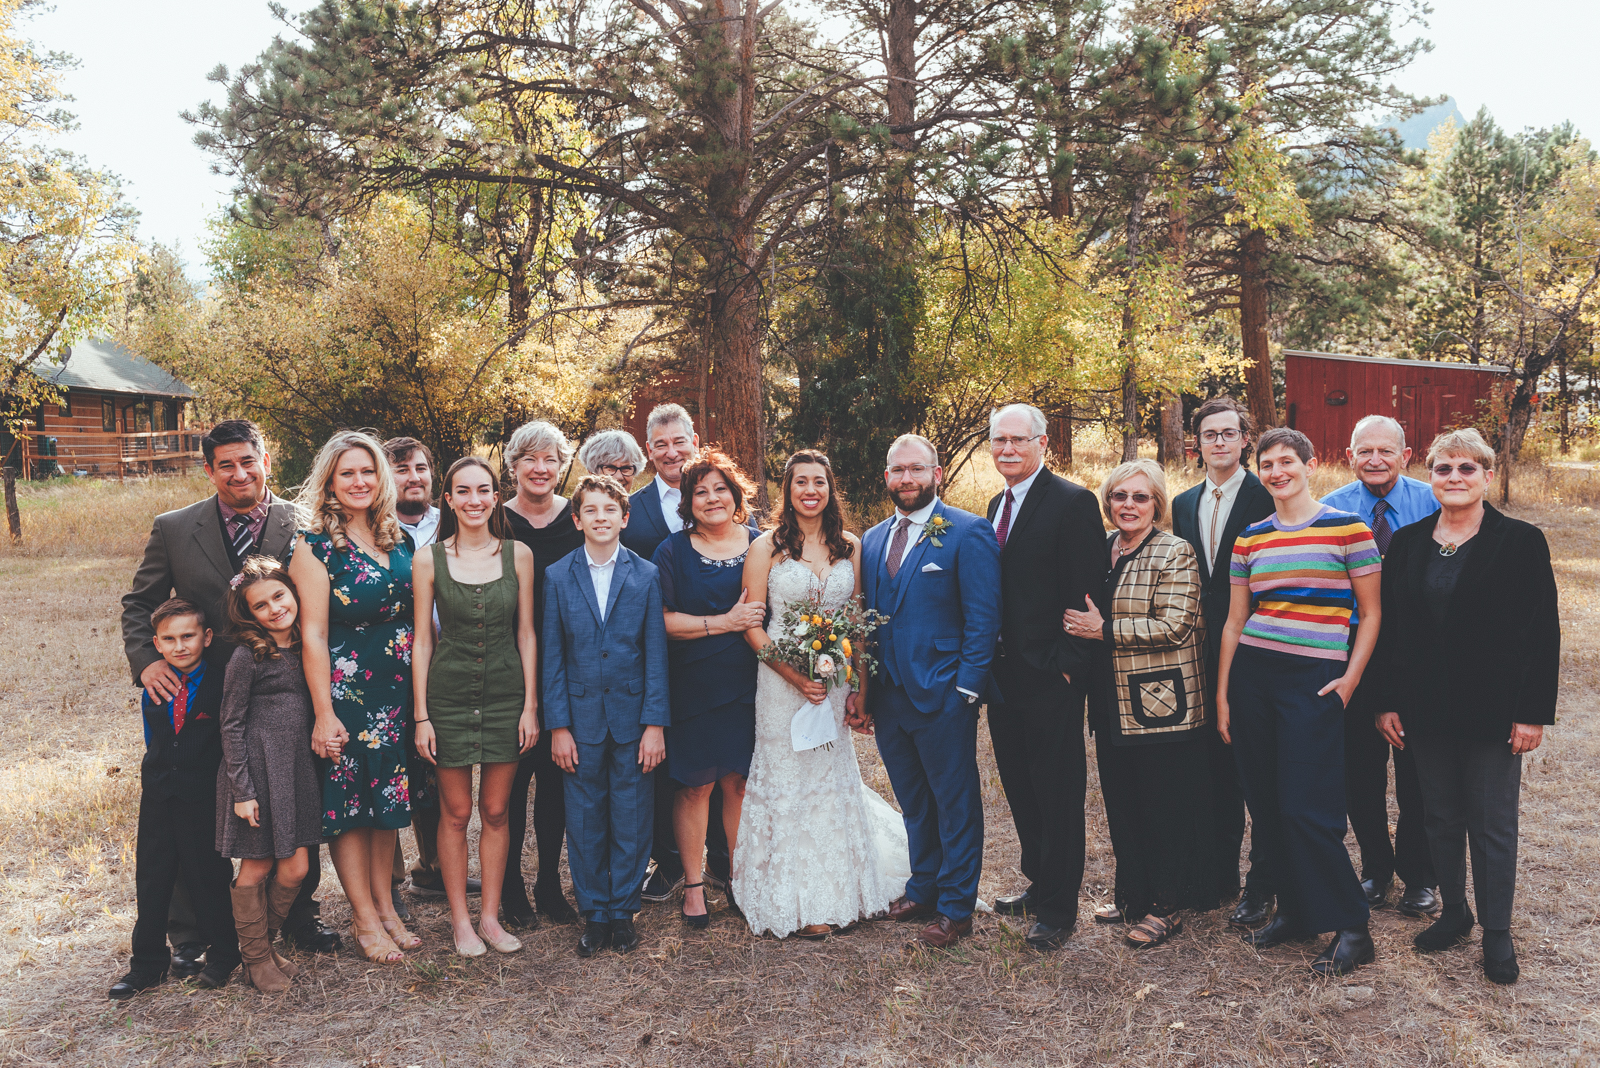 ChadFahnestockPhotography-estes-park-wedding-photography-031.jpg